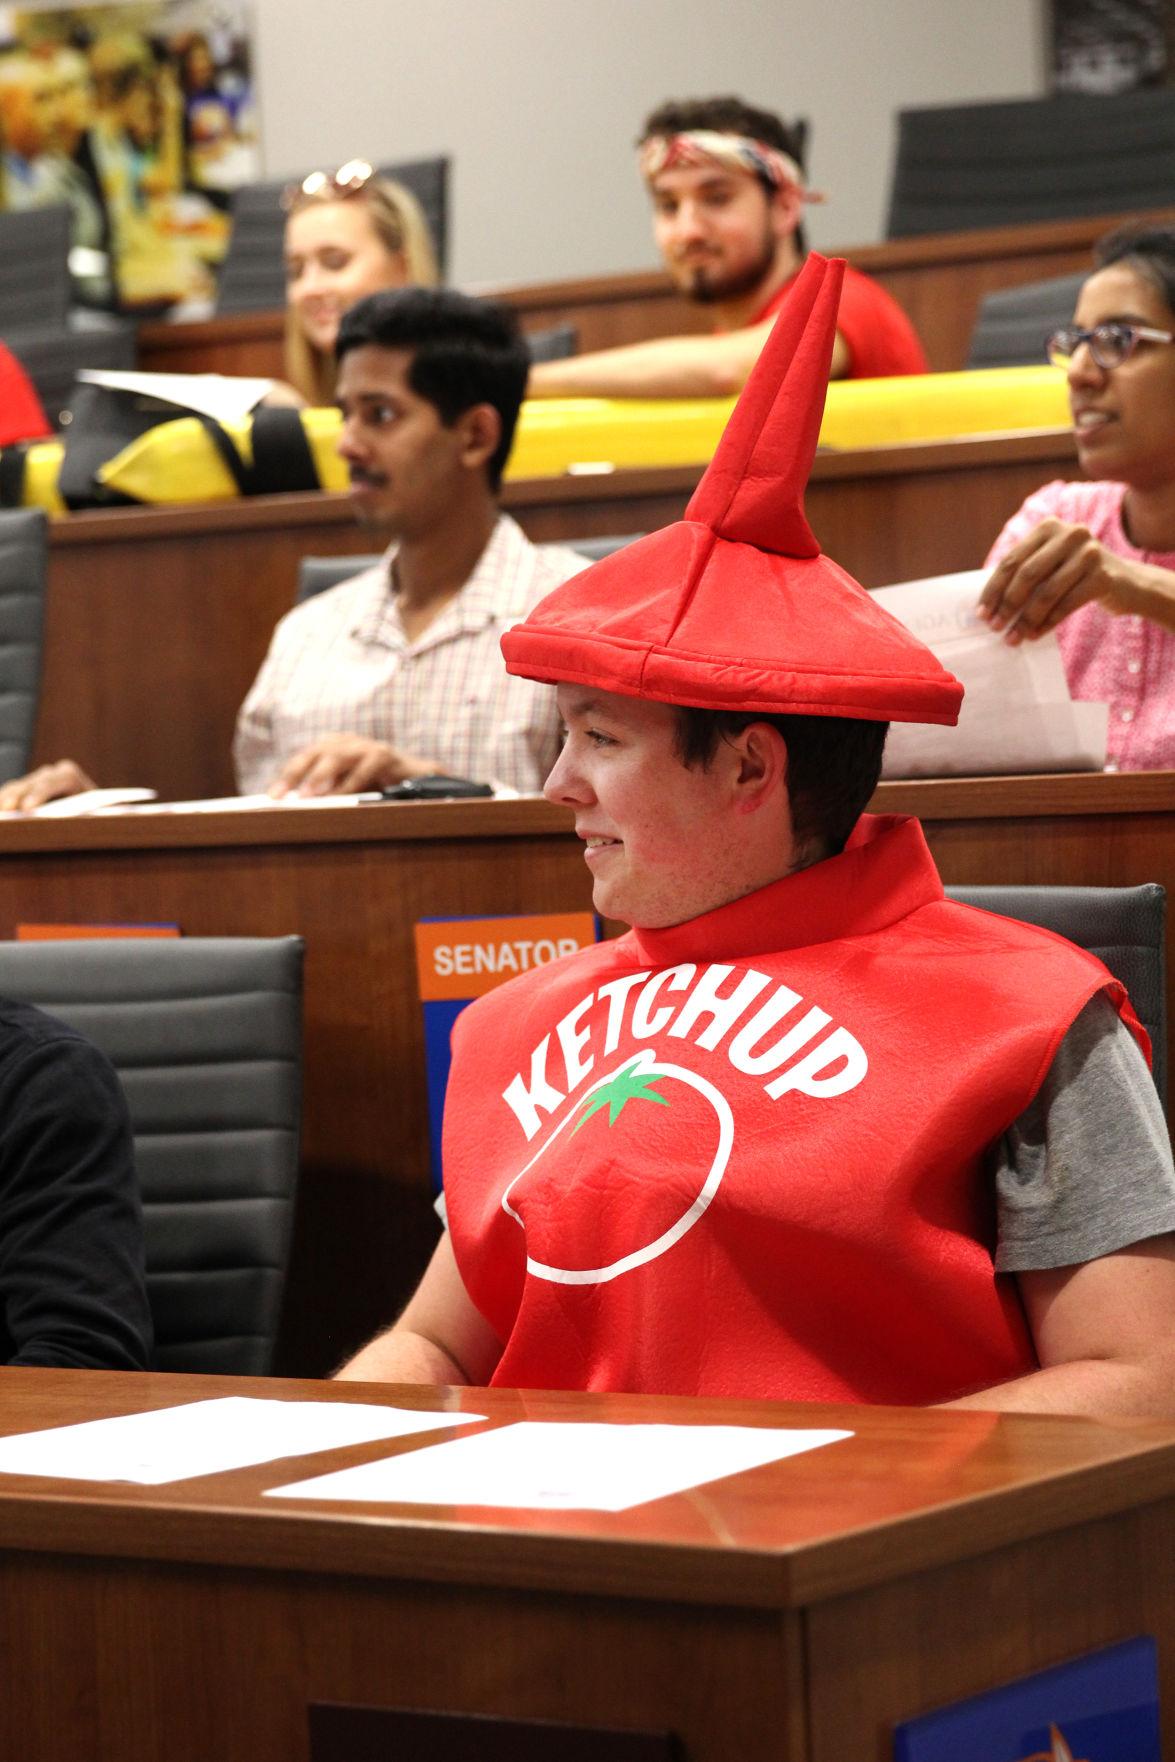 Student Senate discuss 'Renaming the University Center' resolution, dress up for Halloween